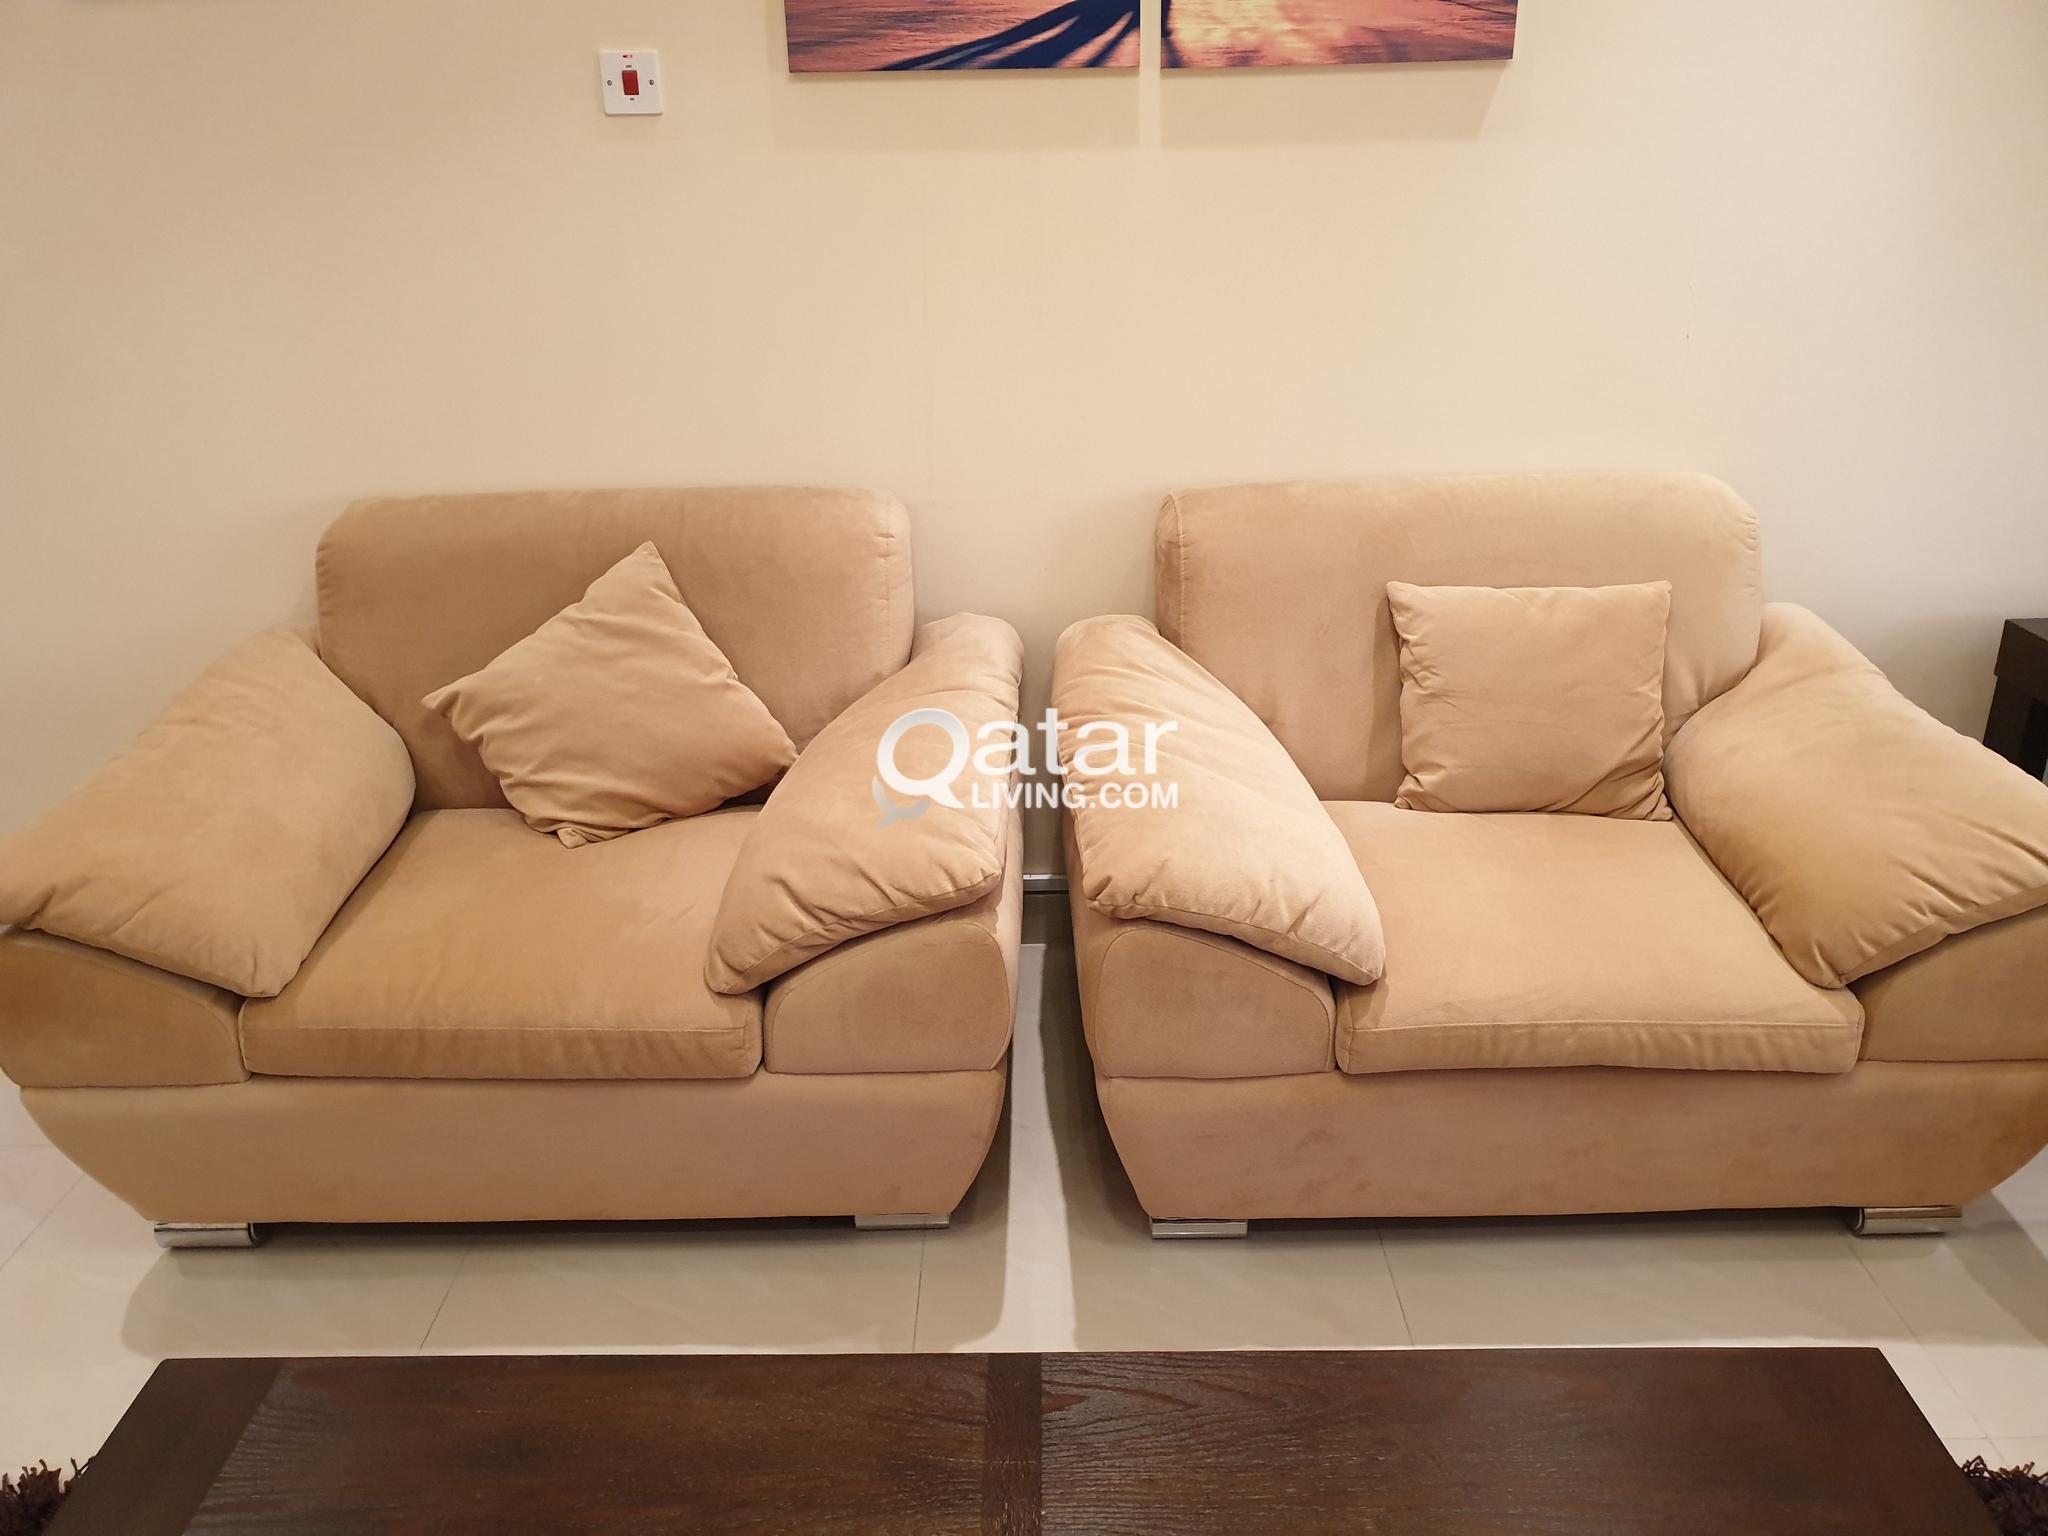 Sofa Set Living Room (Total: 4 Nos, 2 Singles, 1 Double, 1